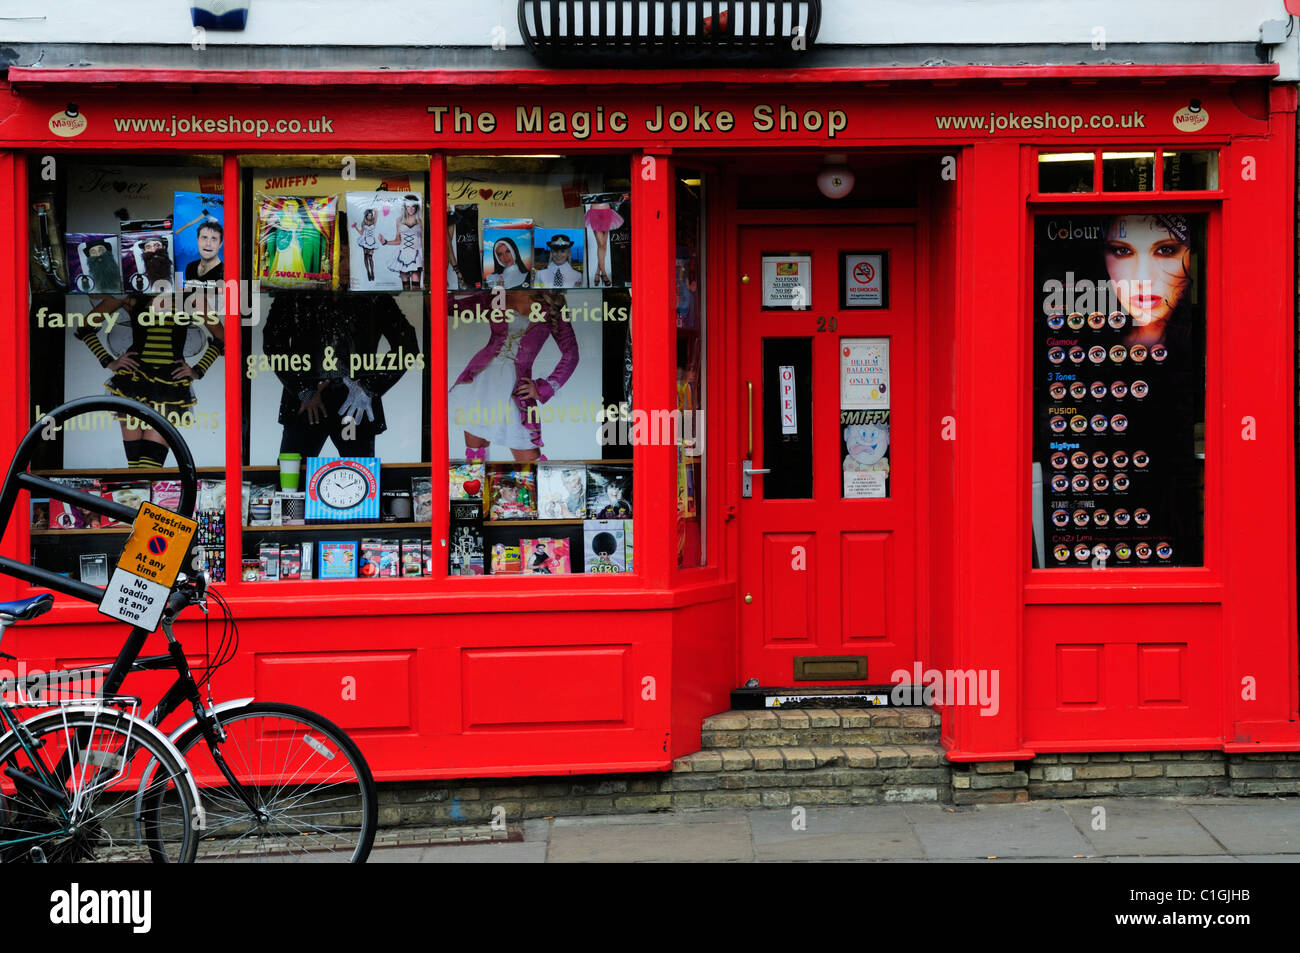 The Magic Joke Shop, Bridge Street, Cambridge, England, UK - Stock Image